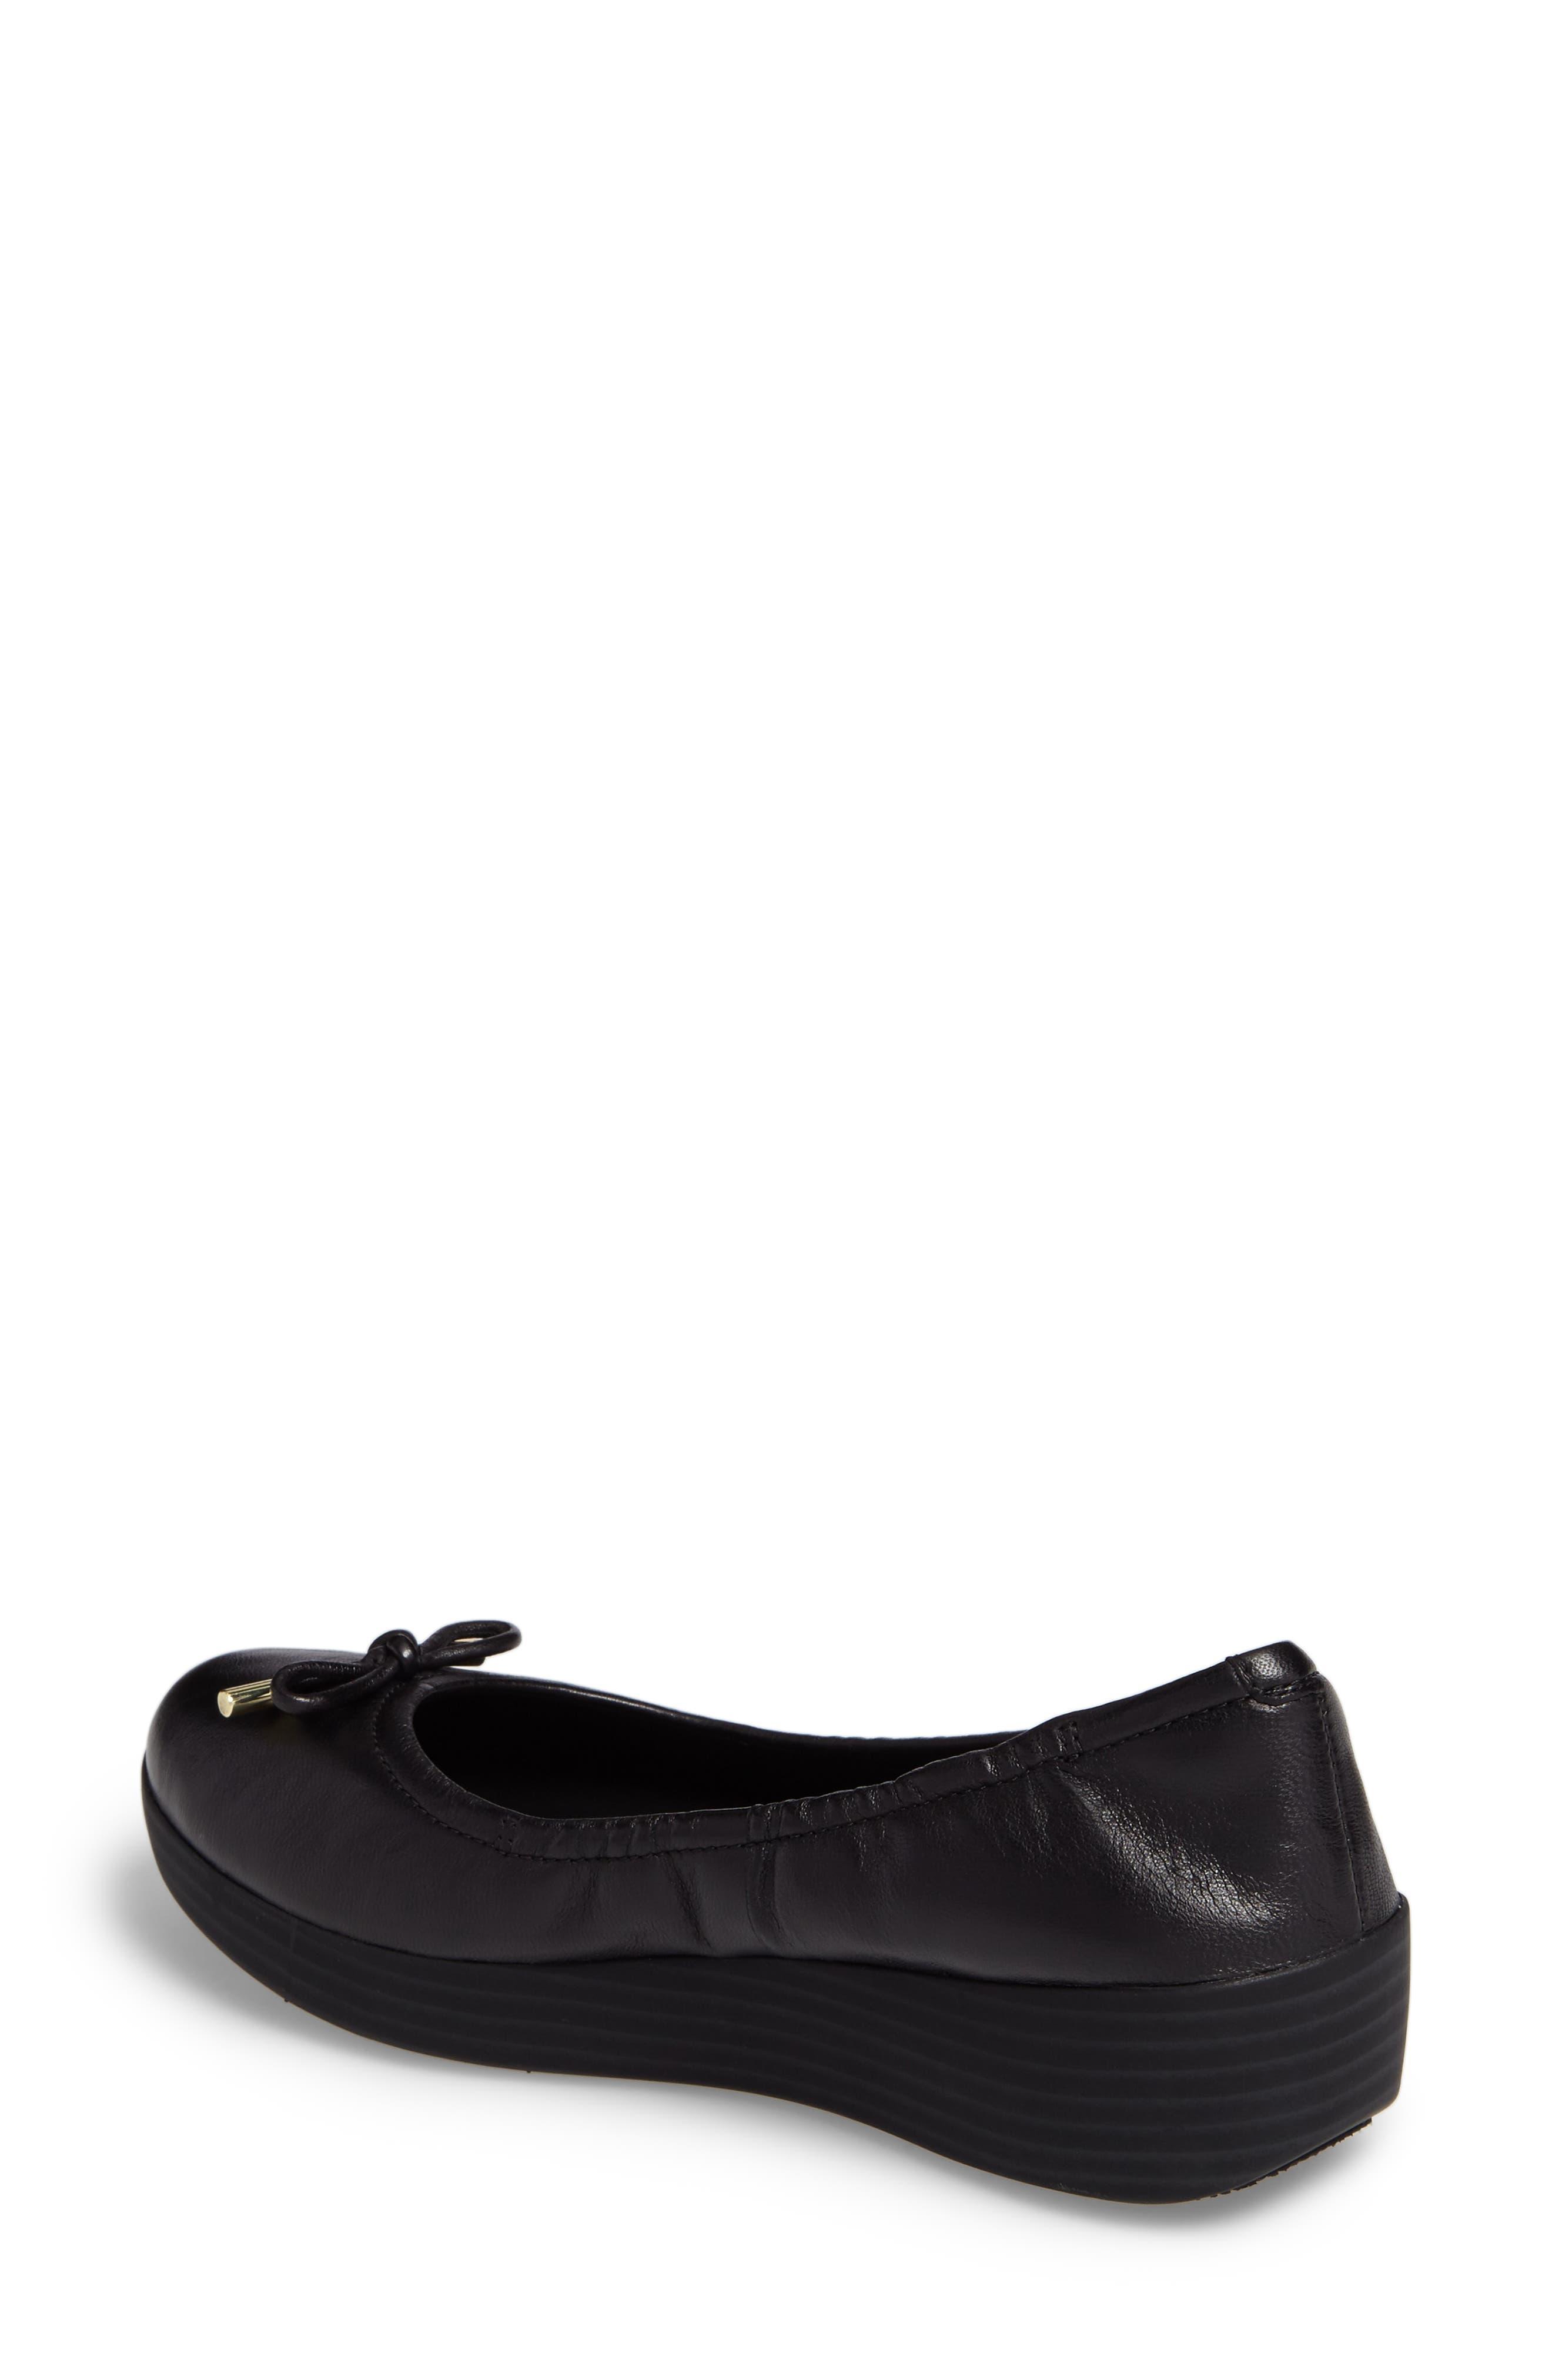 Superbendy Ballerina Flat,                             Alternate thumbnail 2, color,                             Black Leather